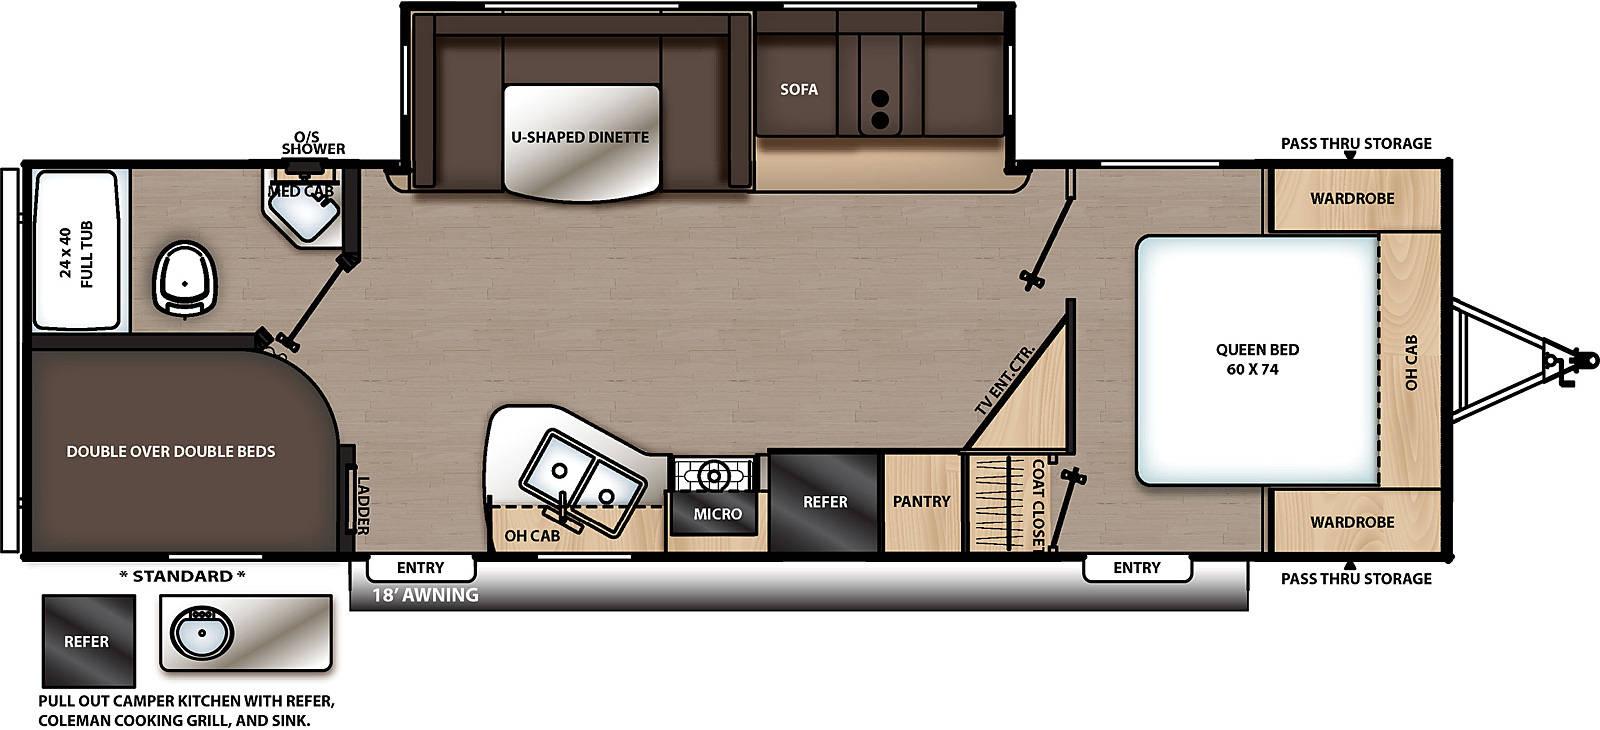 263BHSCK-Floorplan.jpg